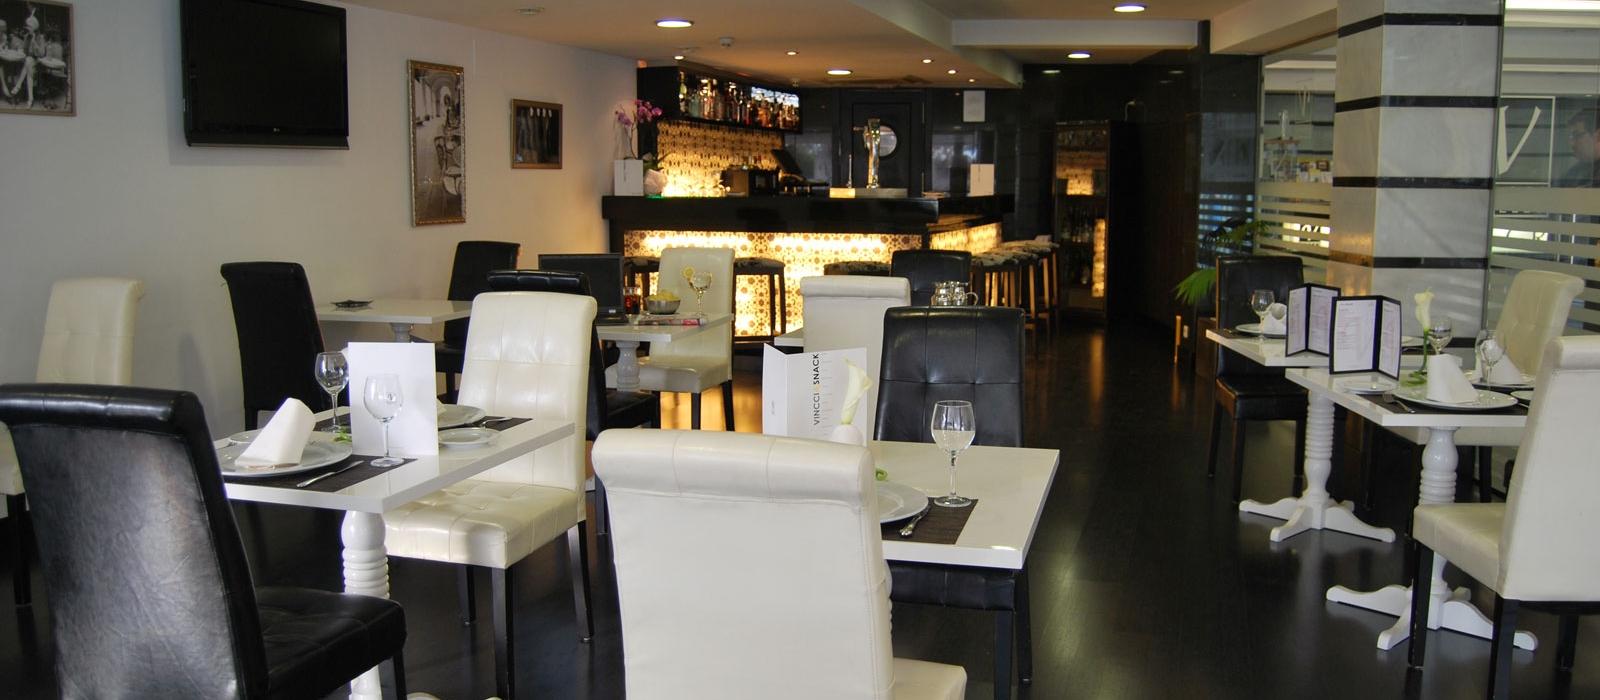 Servicios Hotel Granada - Vincci Hoteles - Bar Lounge